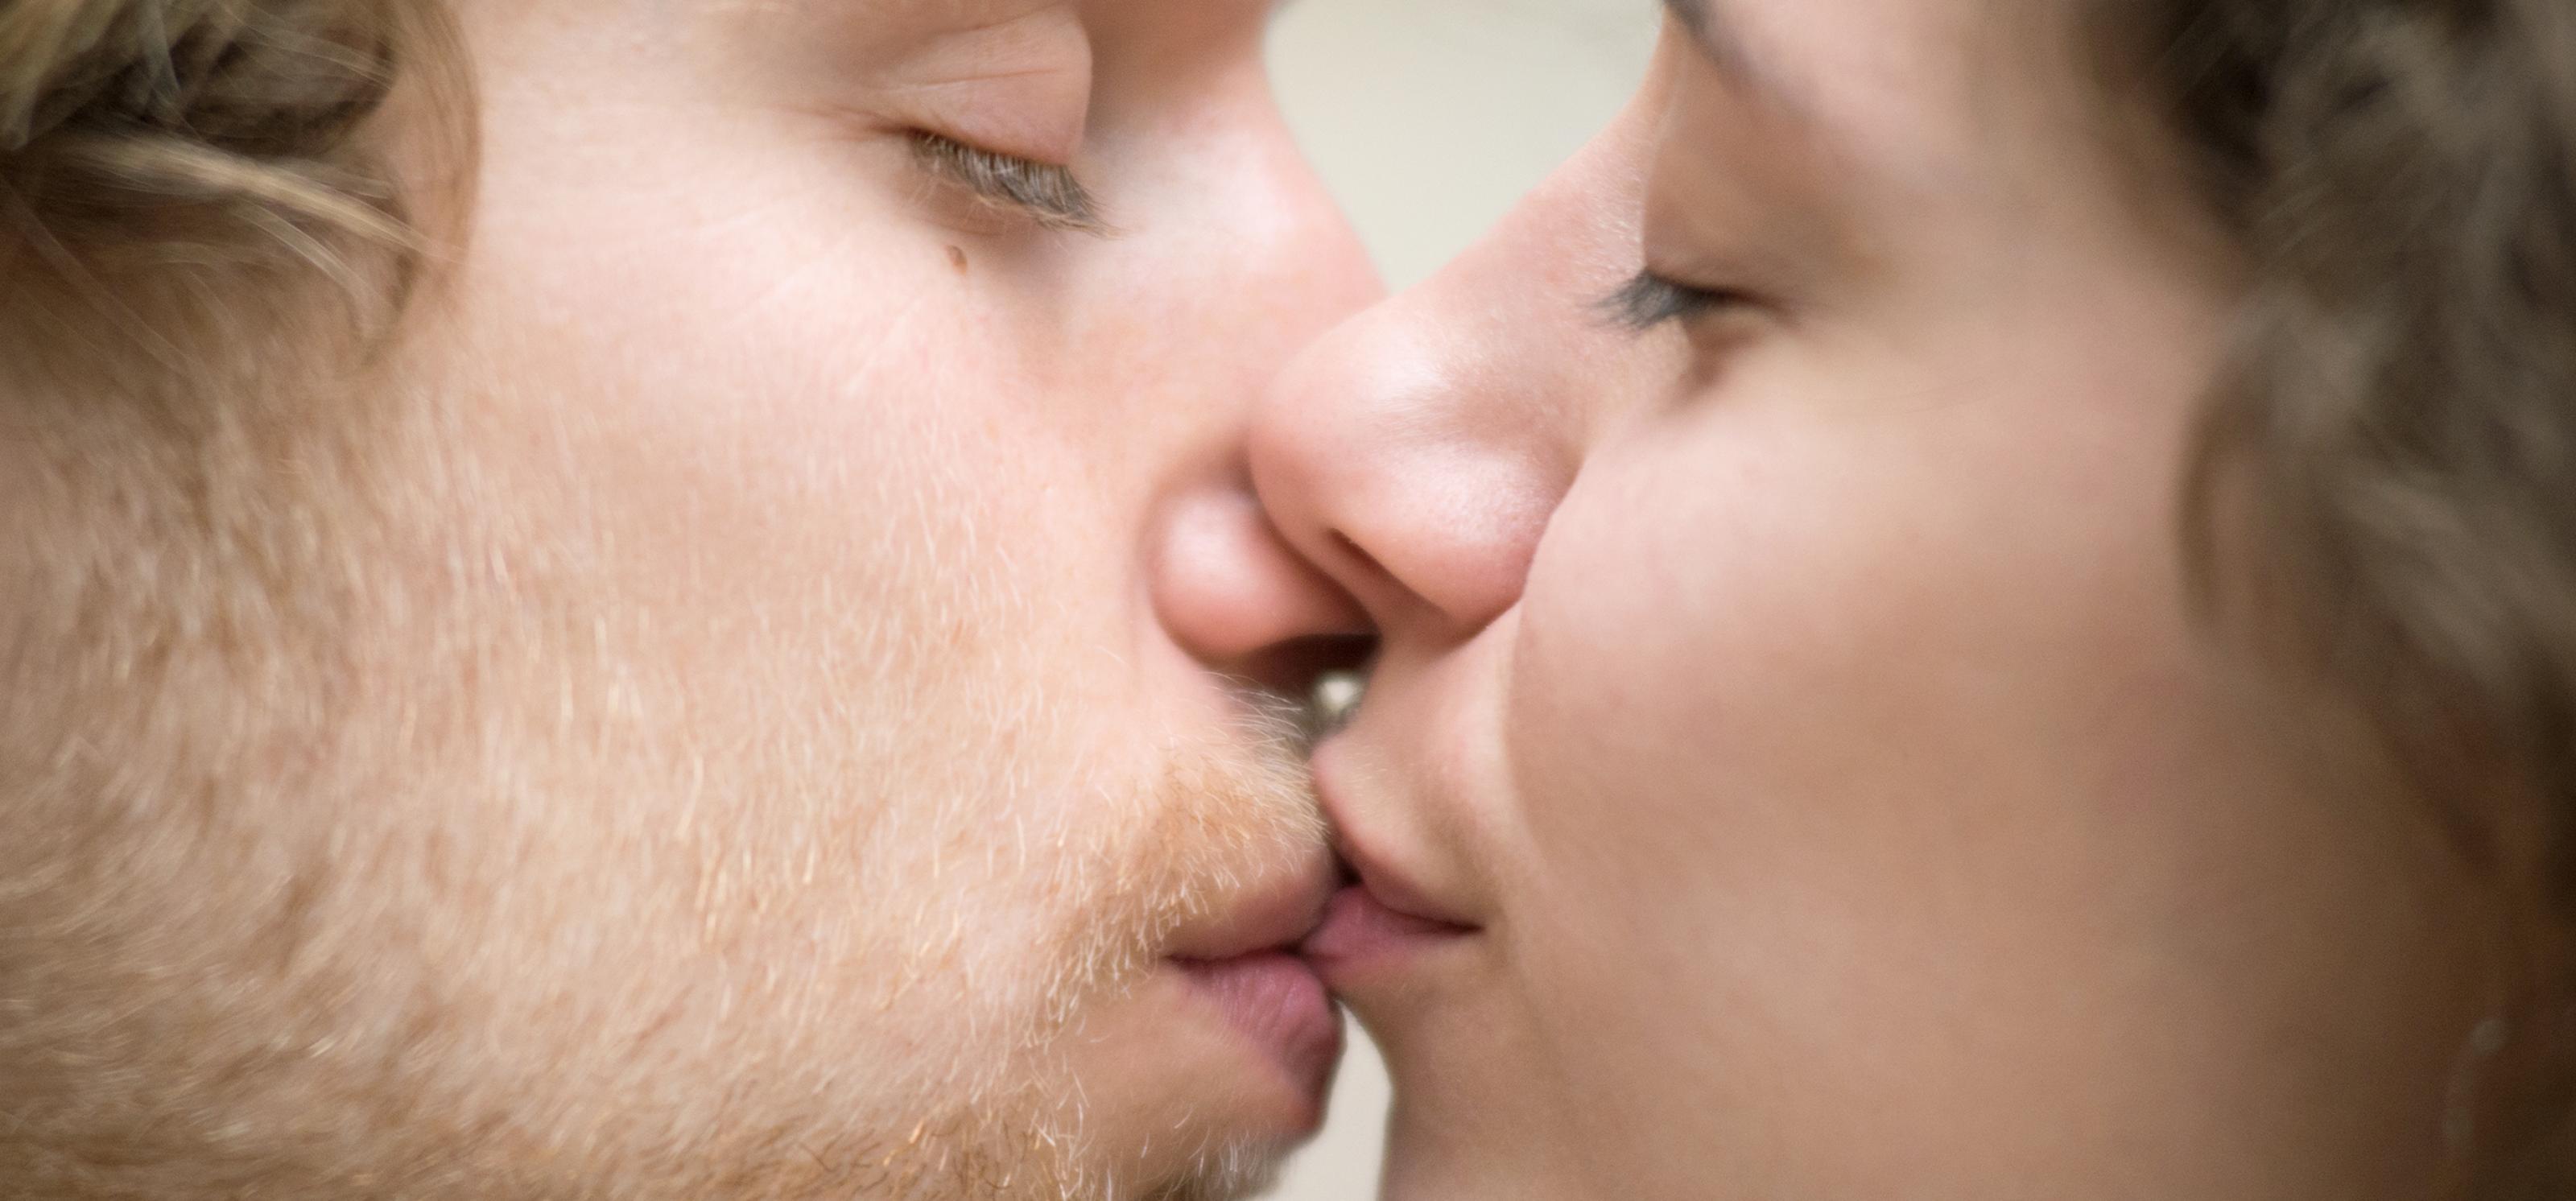 brust küssen